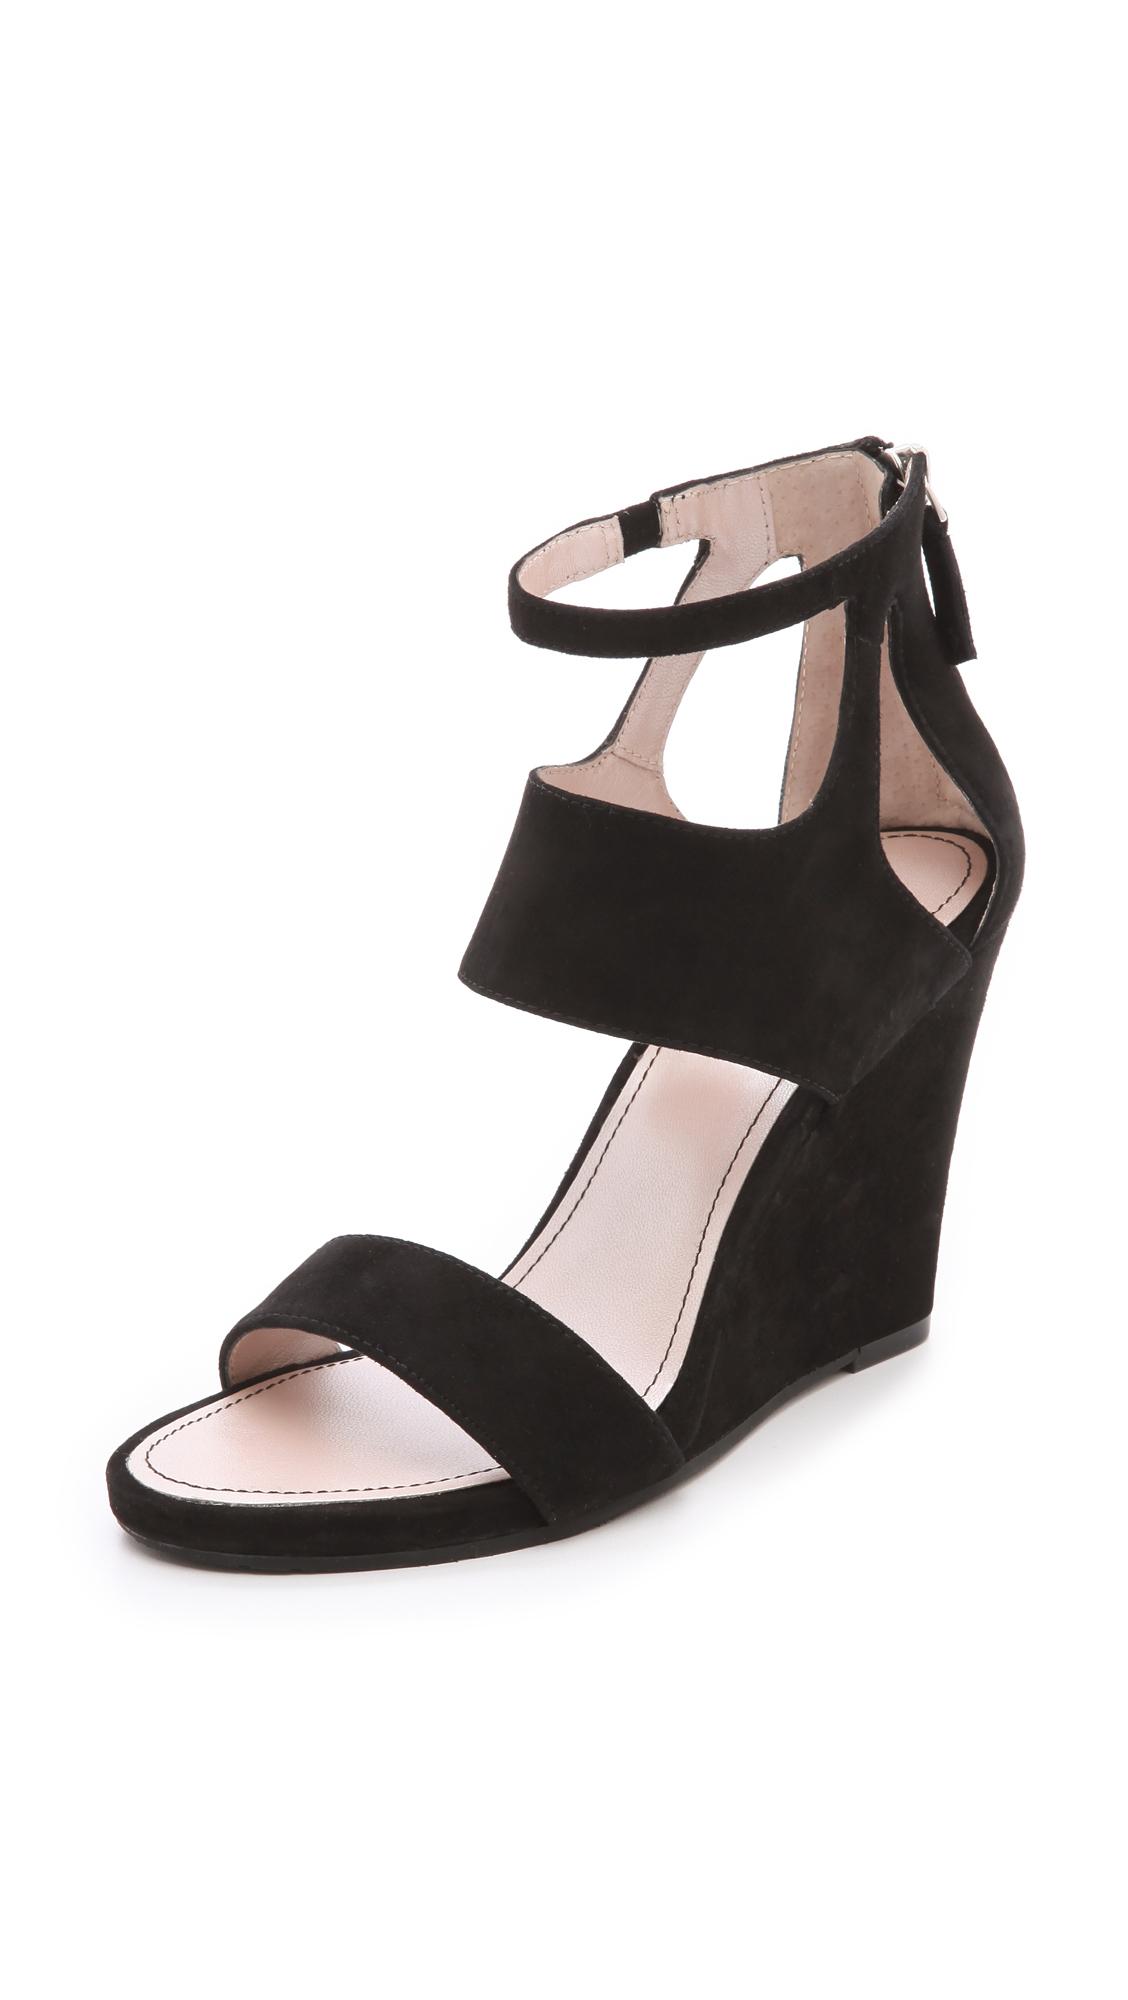 Lyst Dkny Hara Wedge Sandals In Black